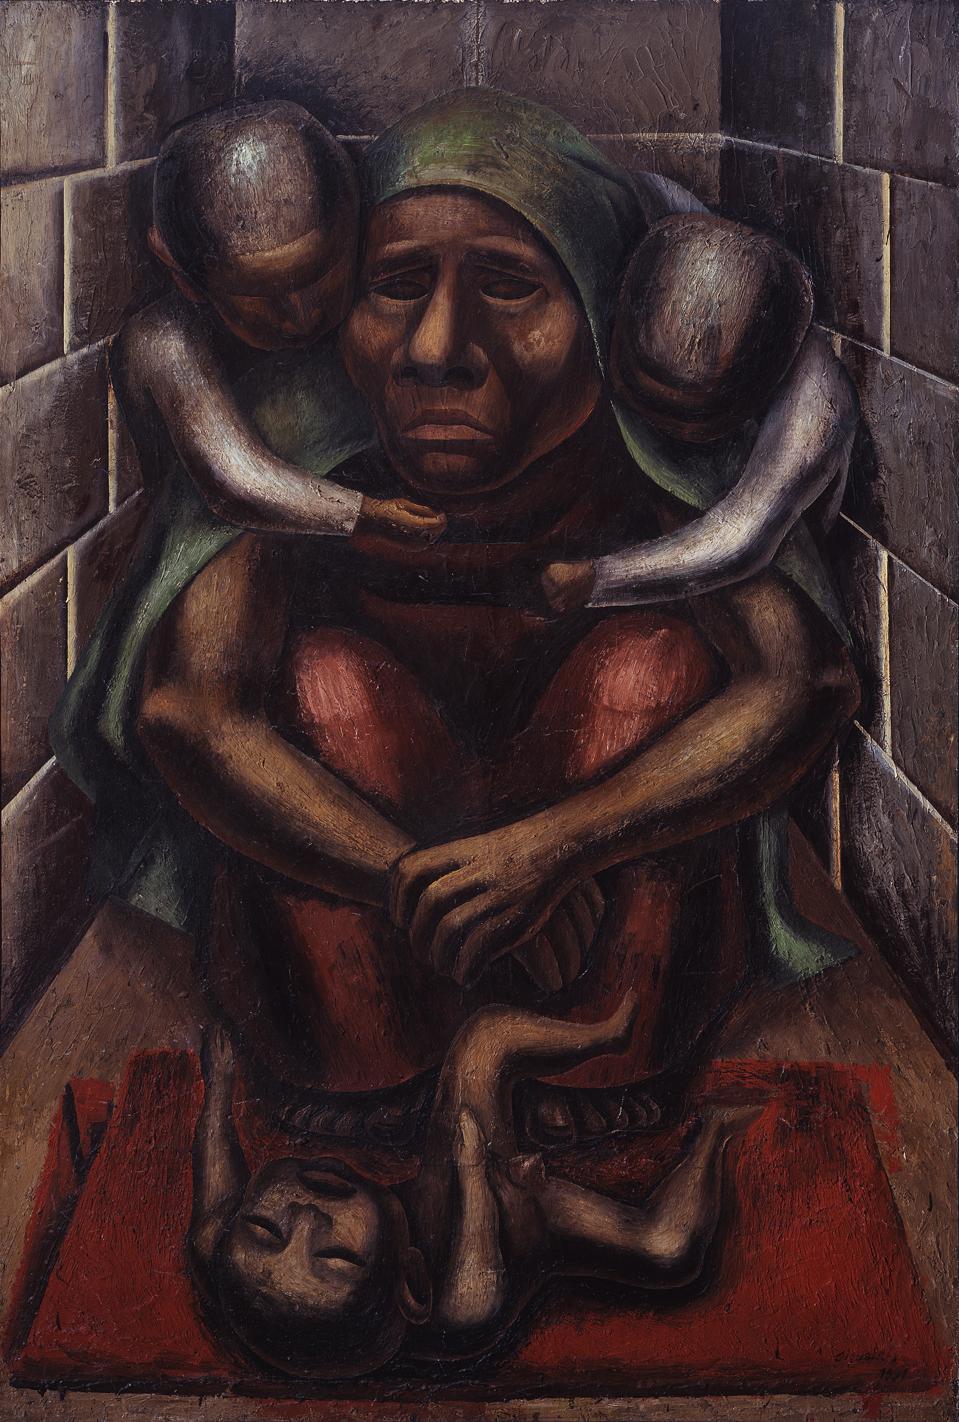 © 2020 Artists Rights Society (ARS), New York / SOMAAP, Mexico City. Reproduction authorized by El Instituto Nacional de Bellas Artes Y Literatura, 2020